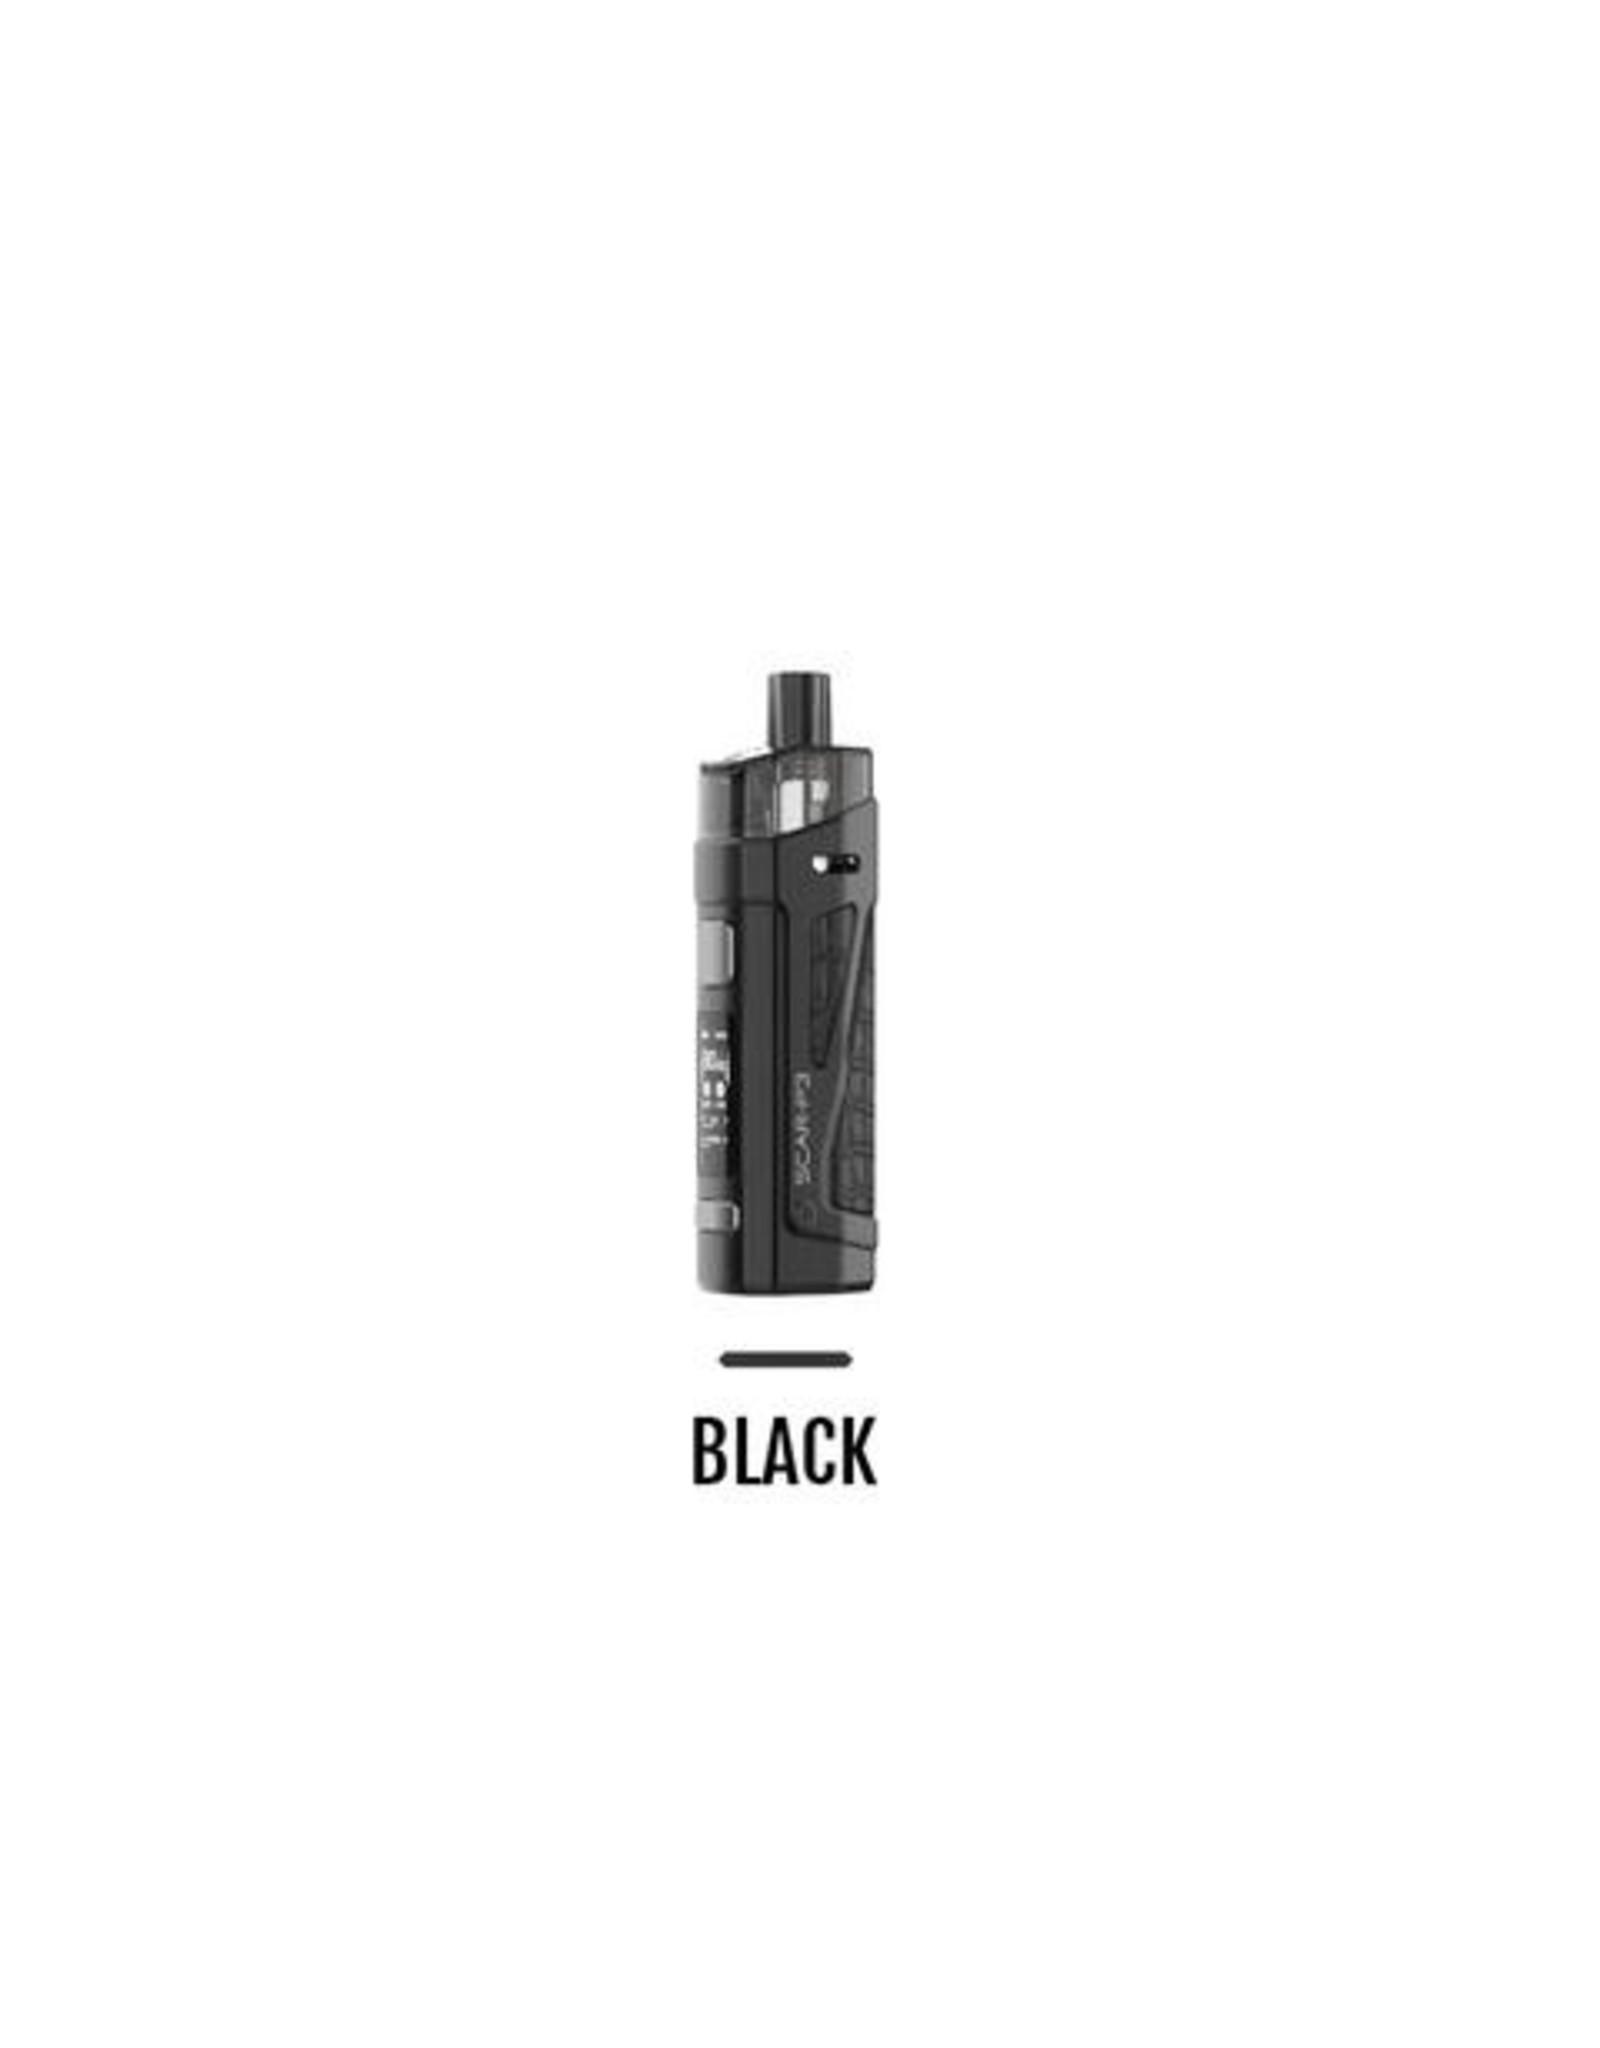 Smok Smok Scar-P3 80W Device